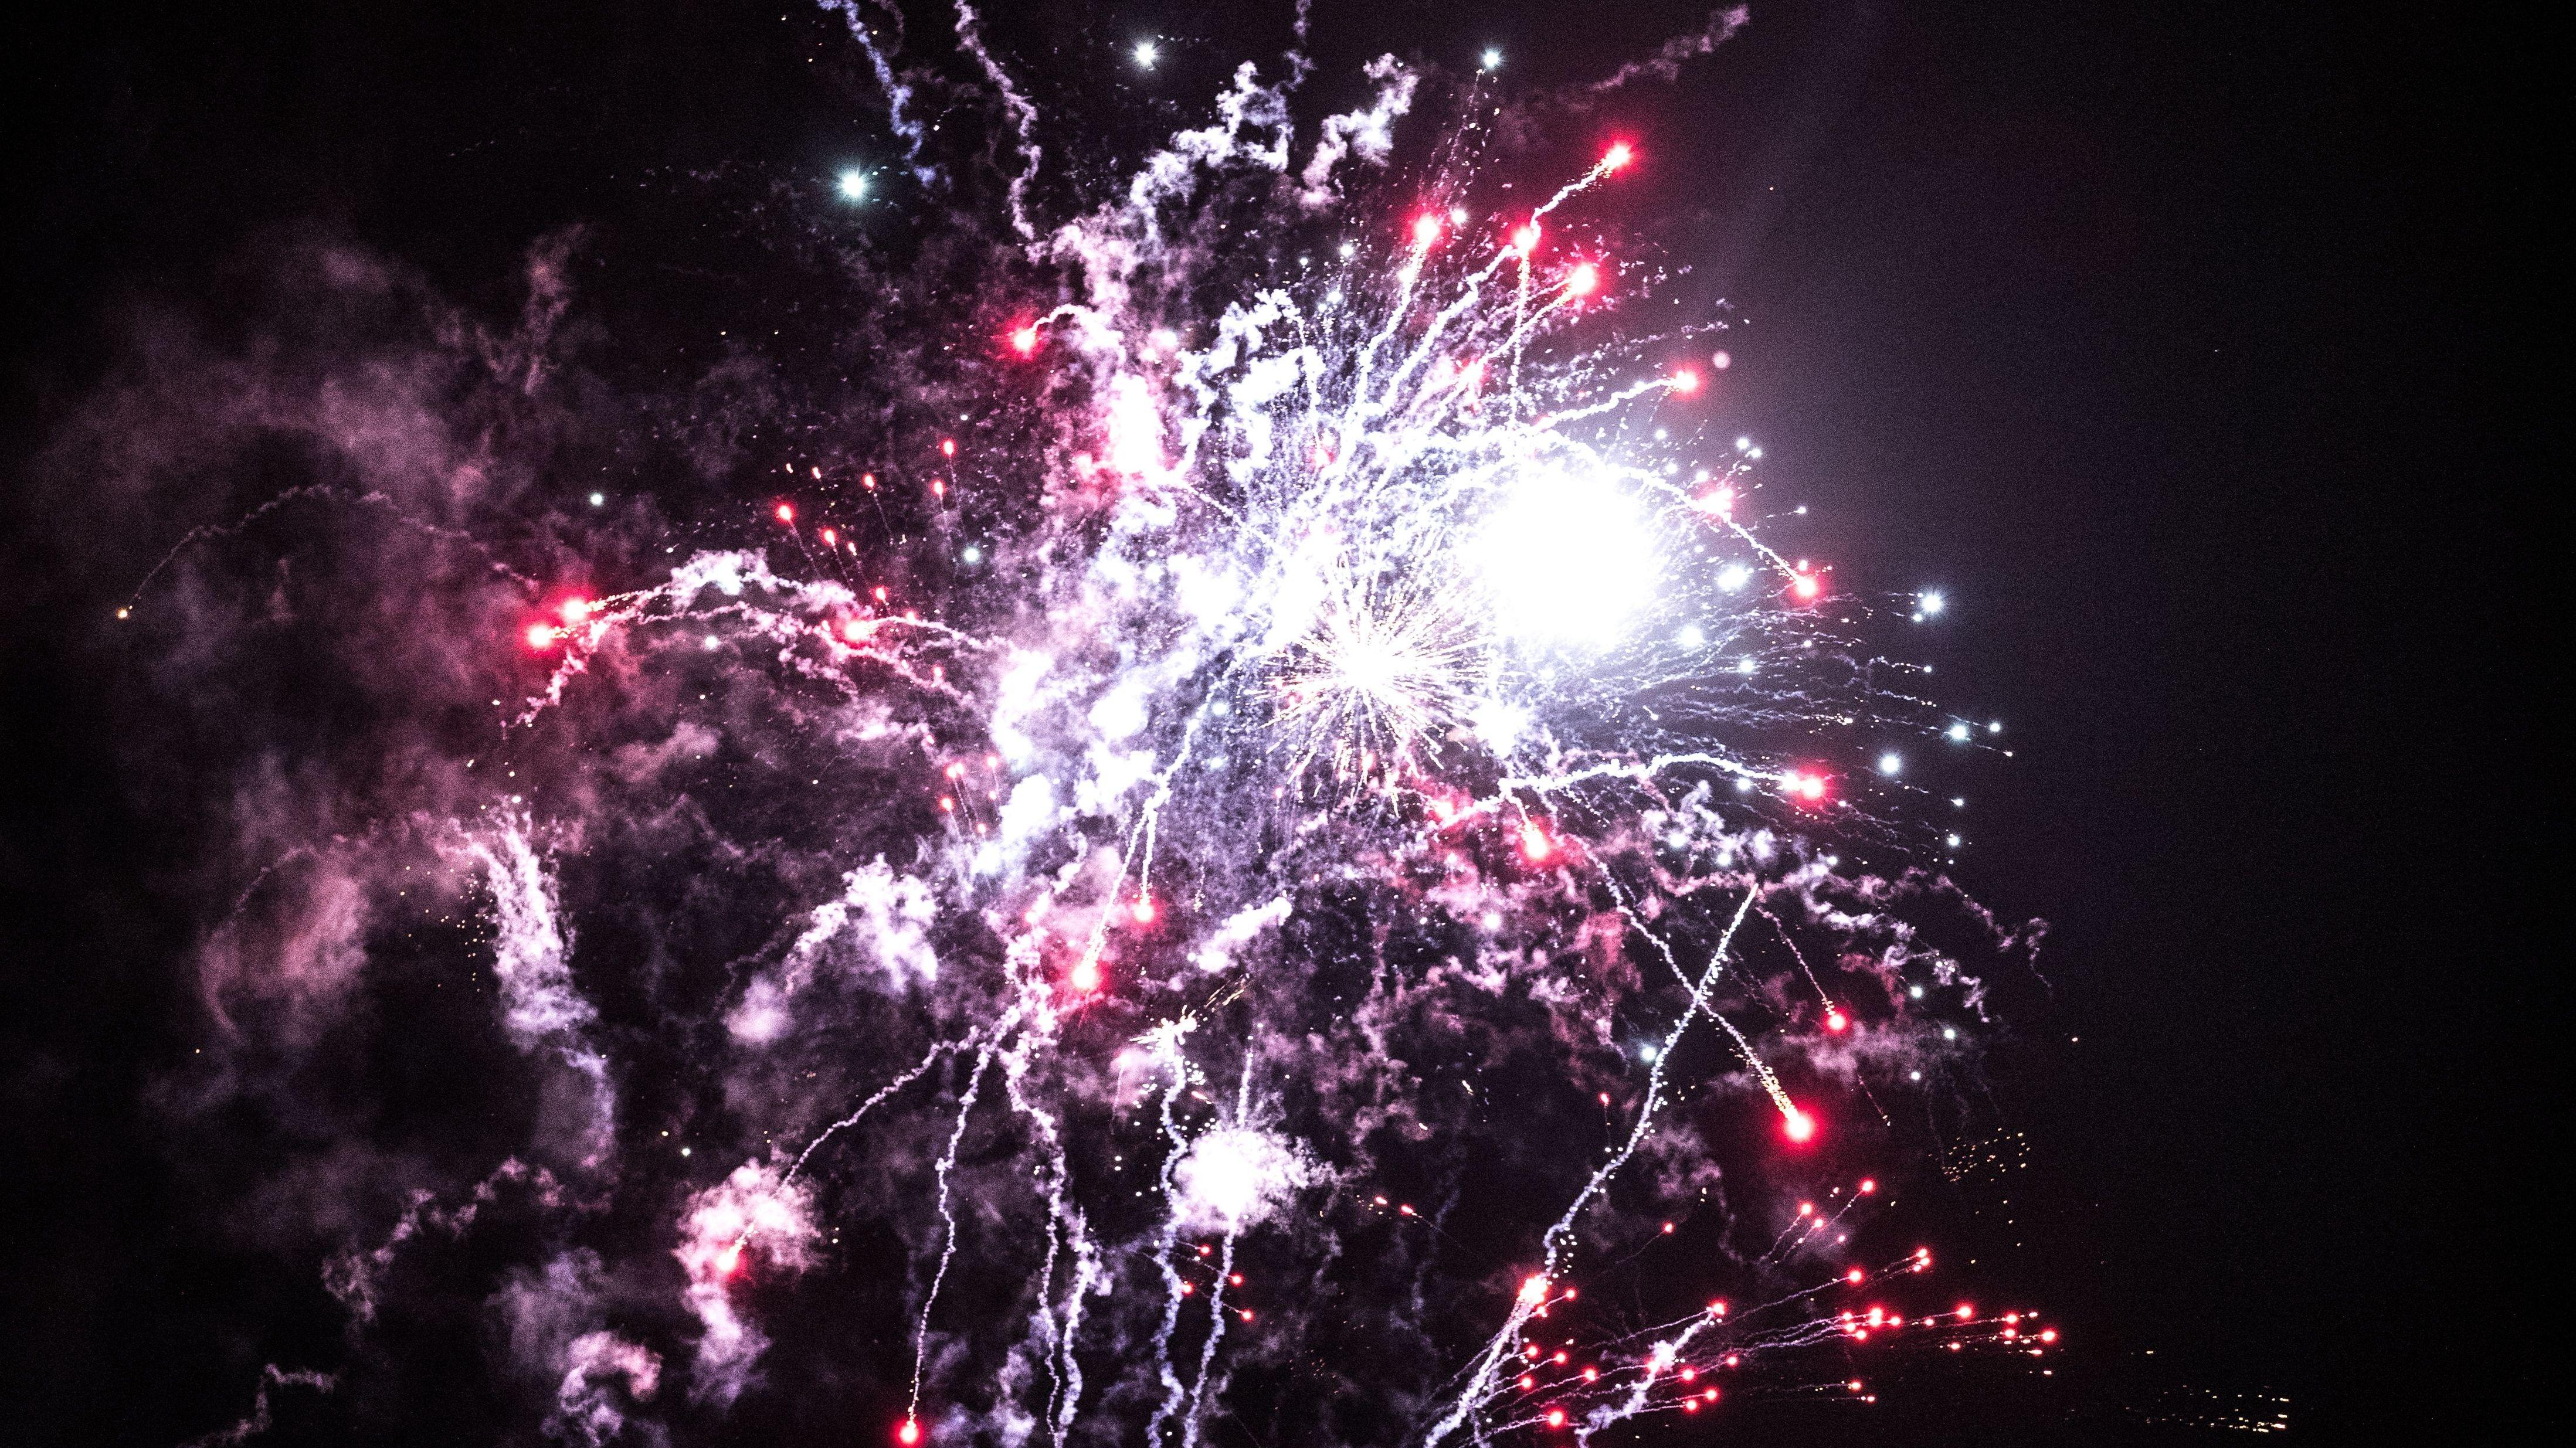 Feuerwerk am Silvesterhimmel